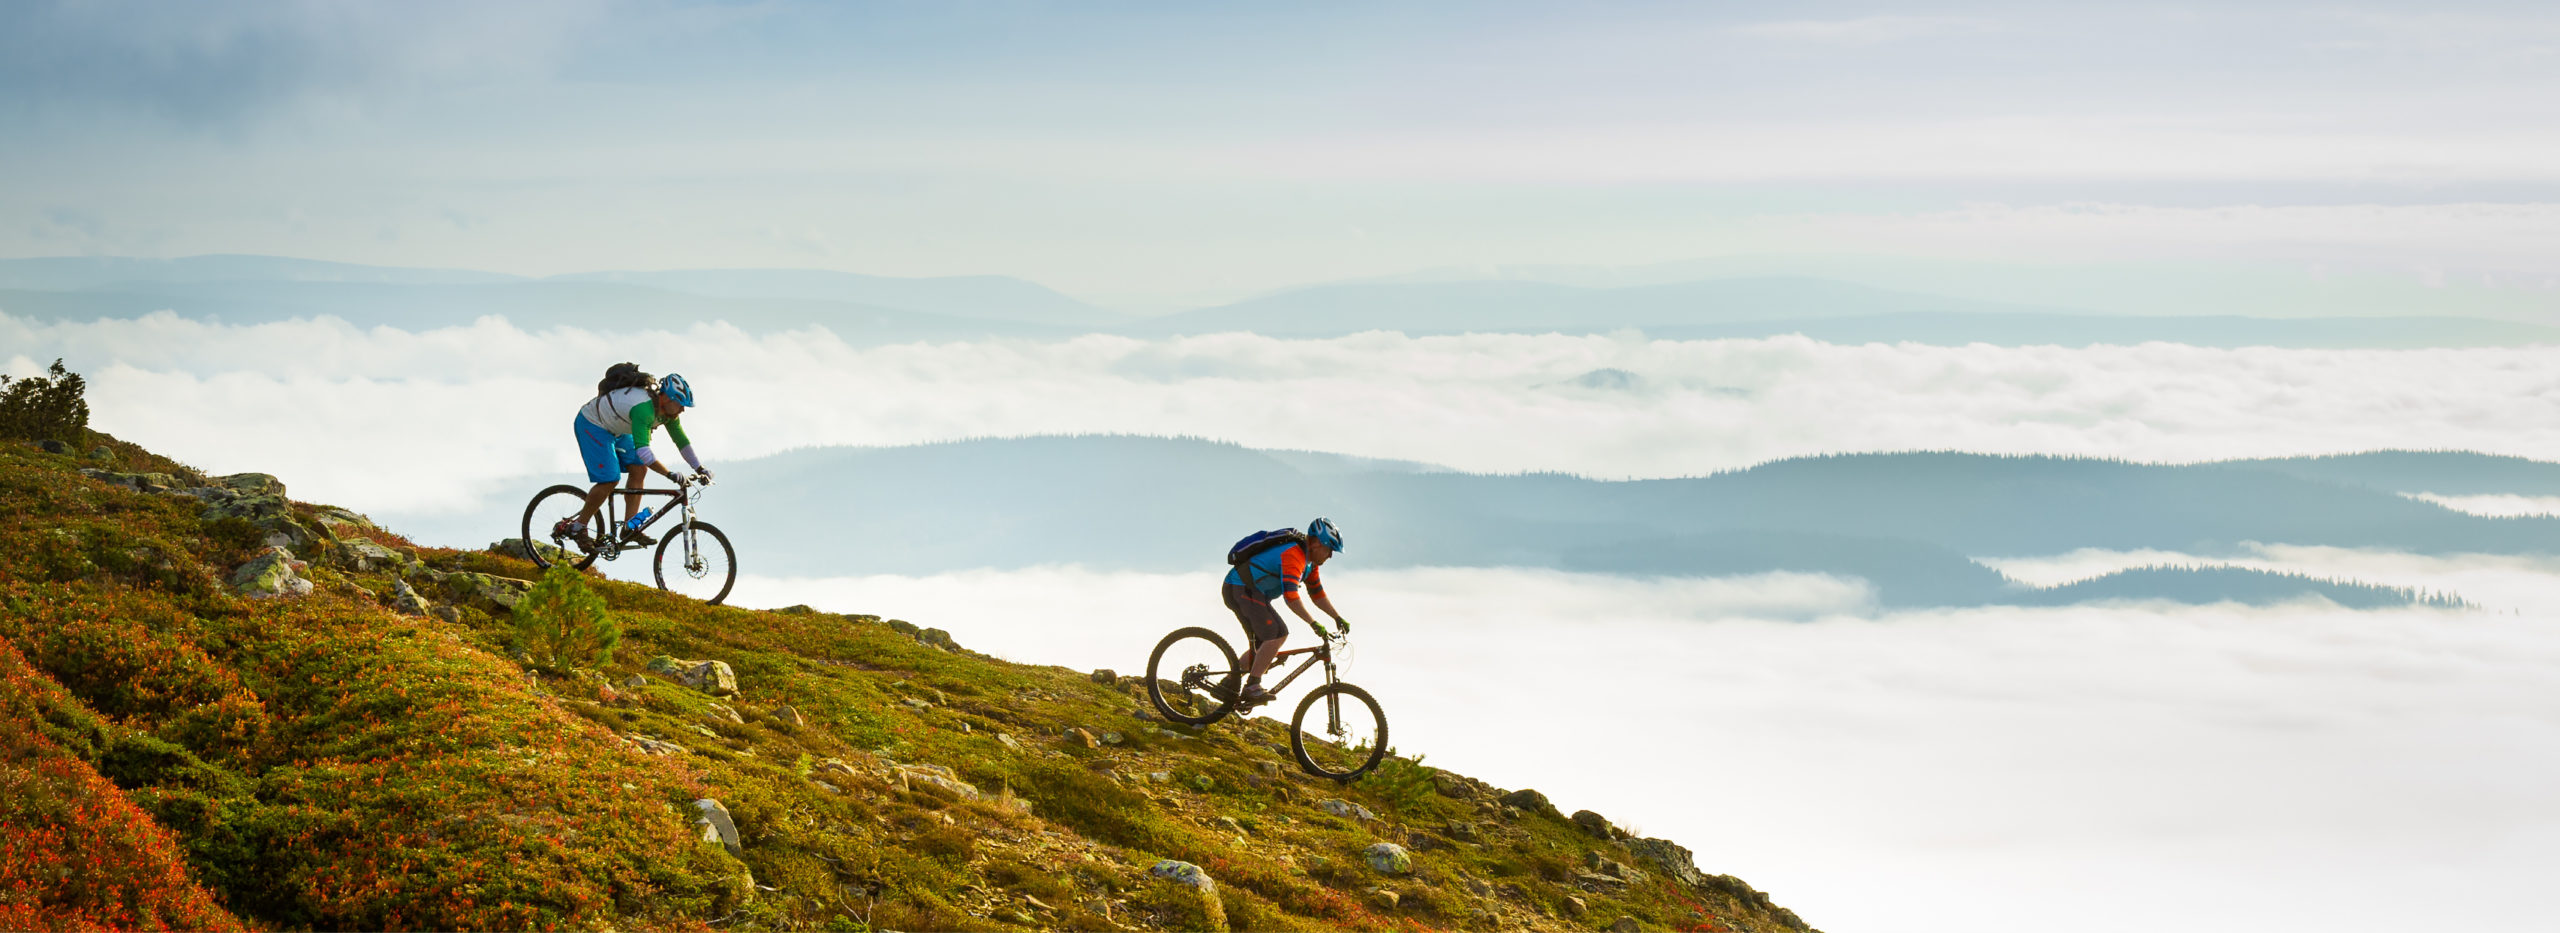 downhill biking in Trysil